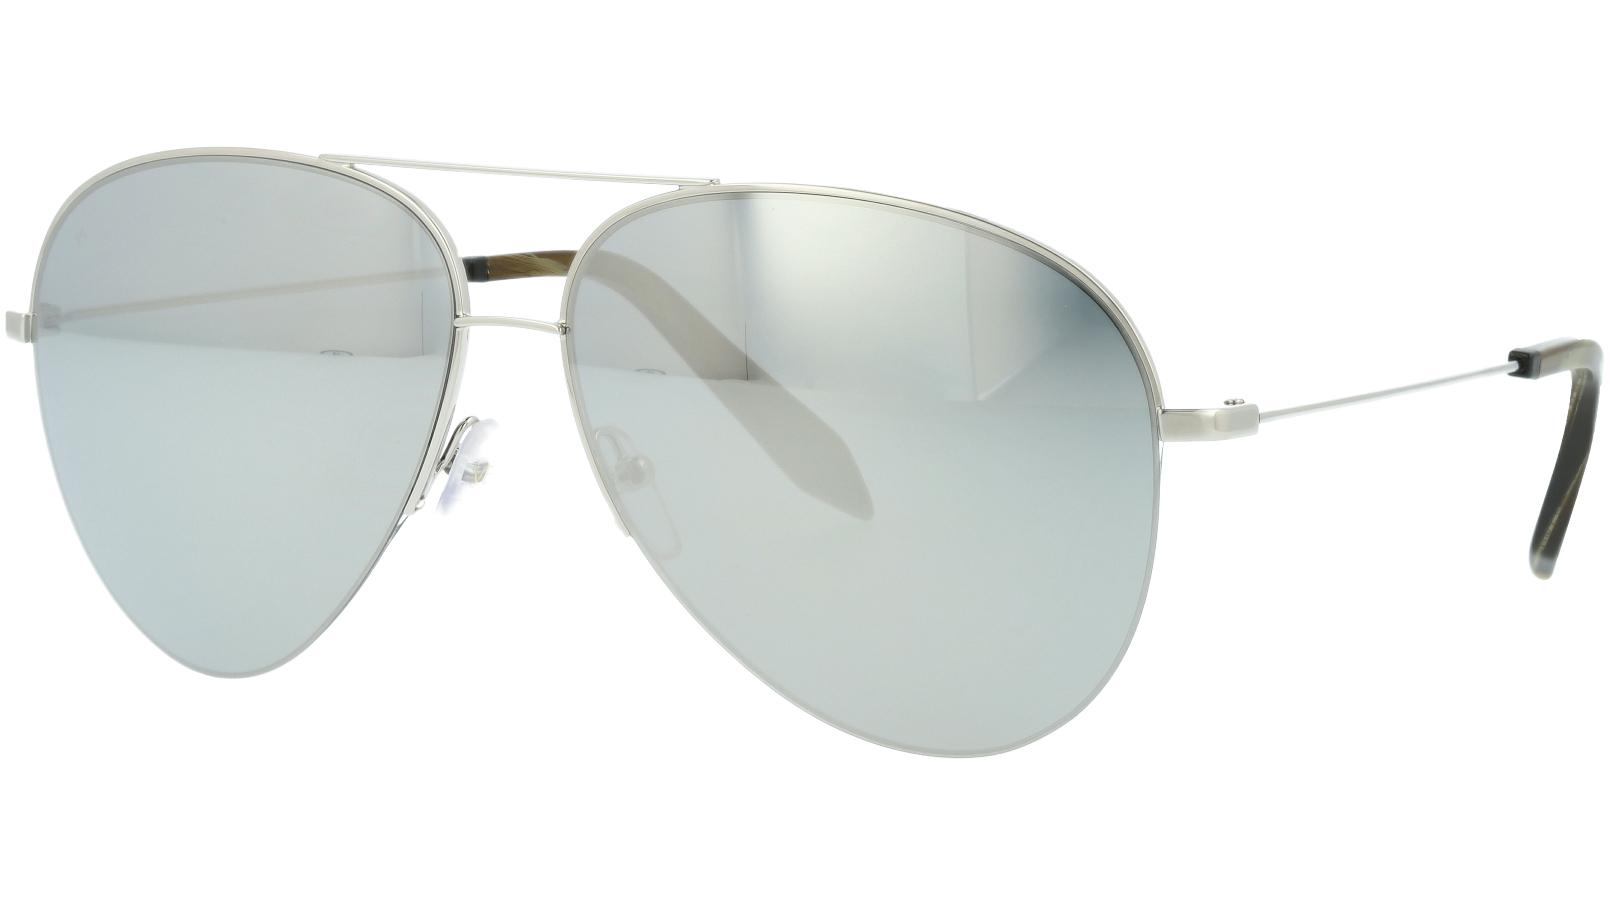 VICTORIA BECKHAM VB90S C07 62 SILVER Sunglasses